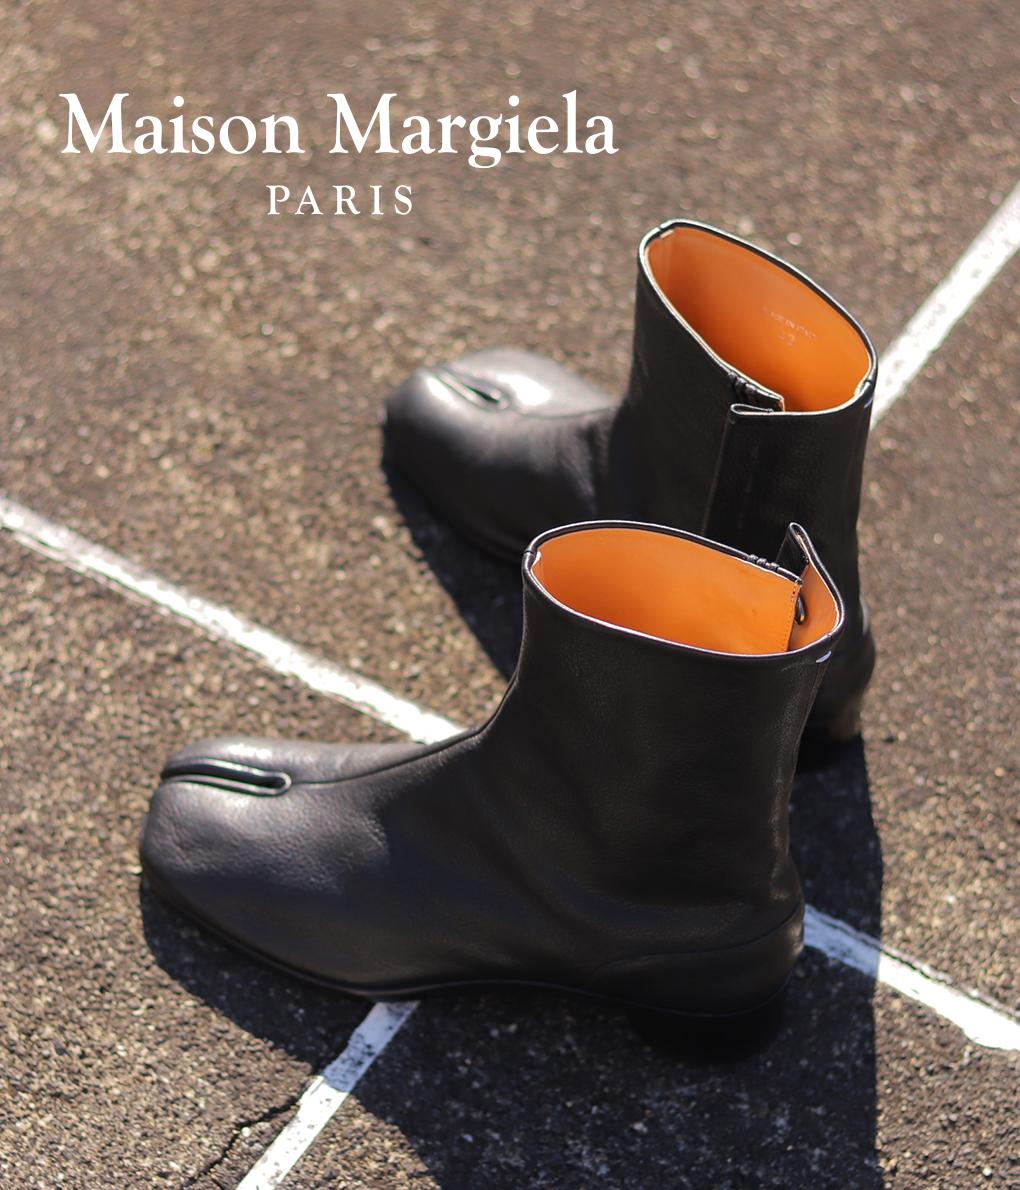 Maison Margiela / メゾン マルジェラ : TABI BOOTS : タビブーツ メンズ : S57WU0153【RIP】【BJB】